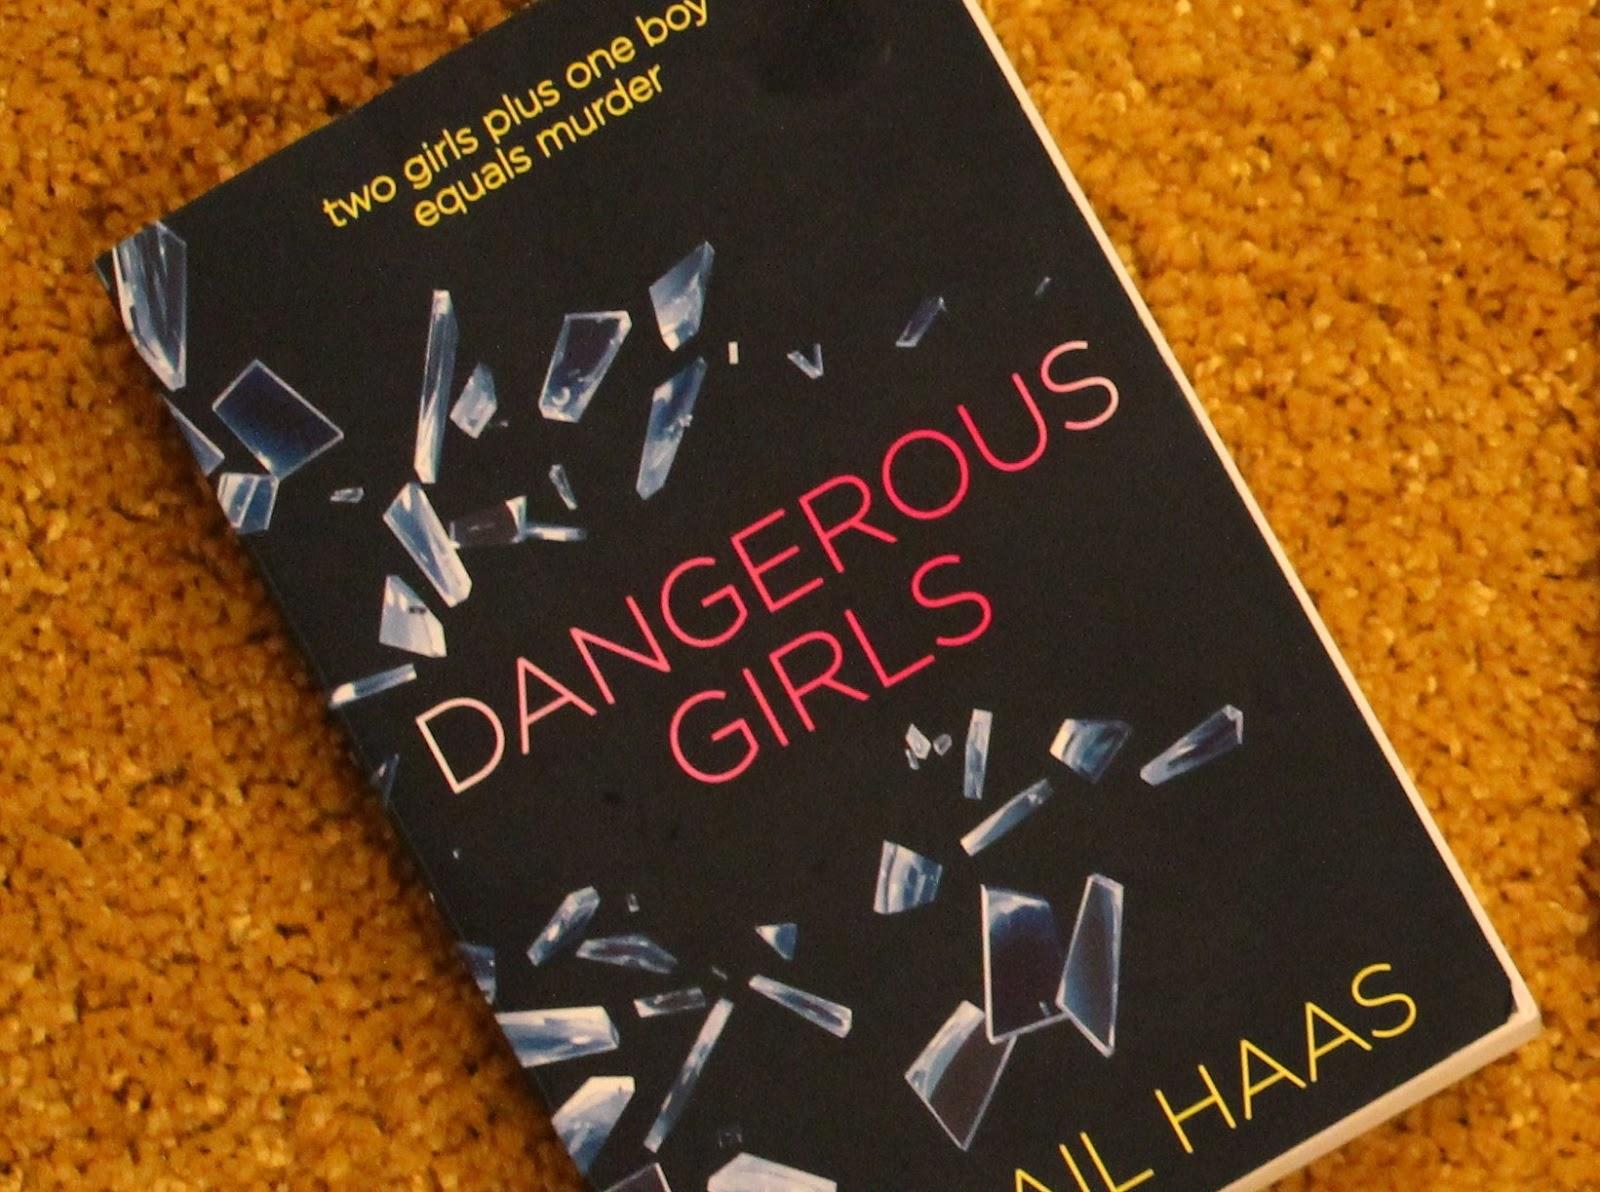 Gingerbread Smiles - Book Review, Abigail Haas - Dangerous Girls